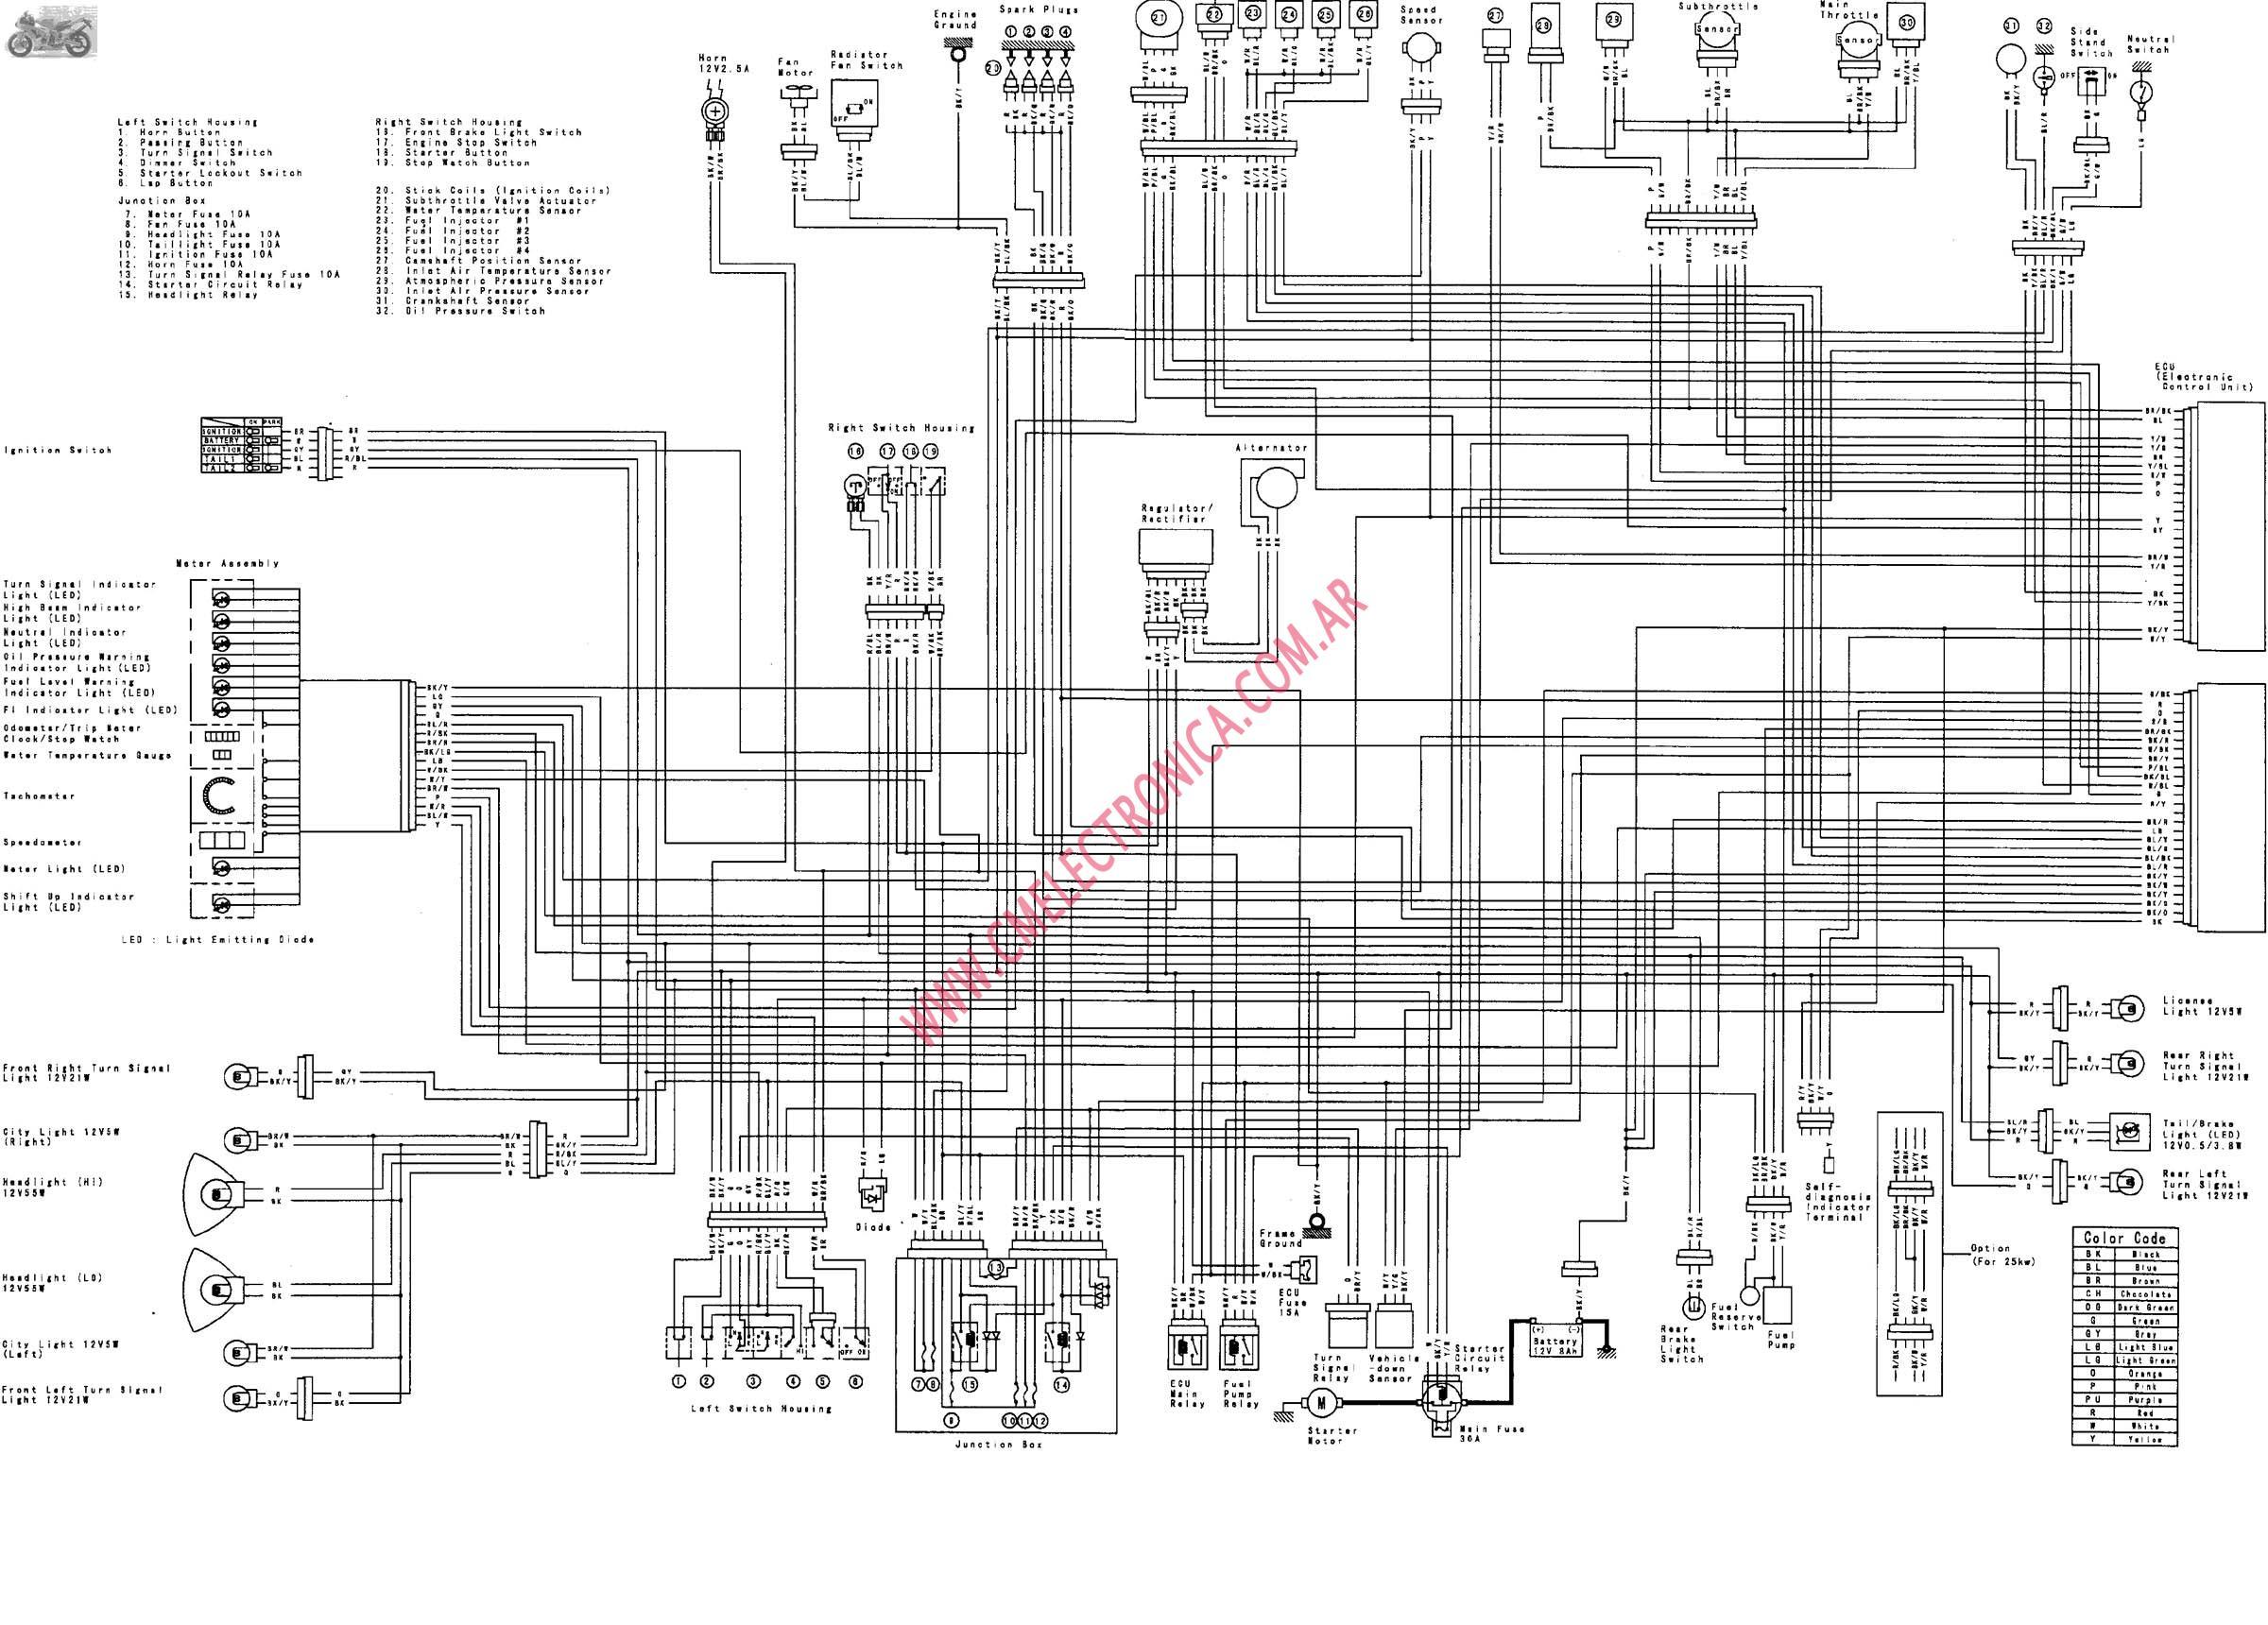 40hp Evinrude Diagrams Wiring Diagrams Pictures